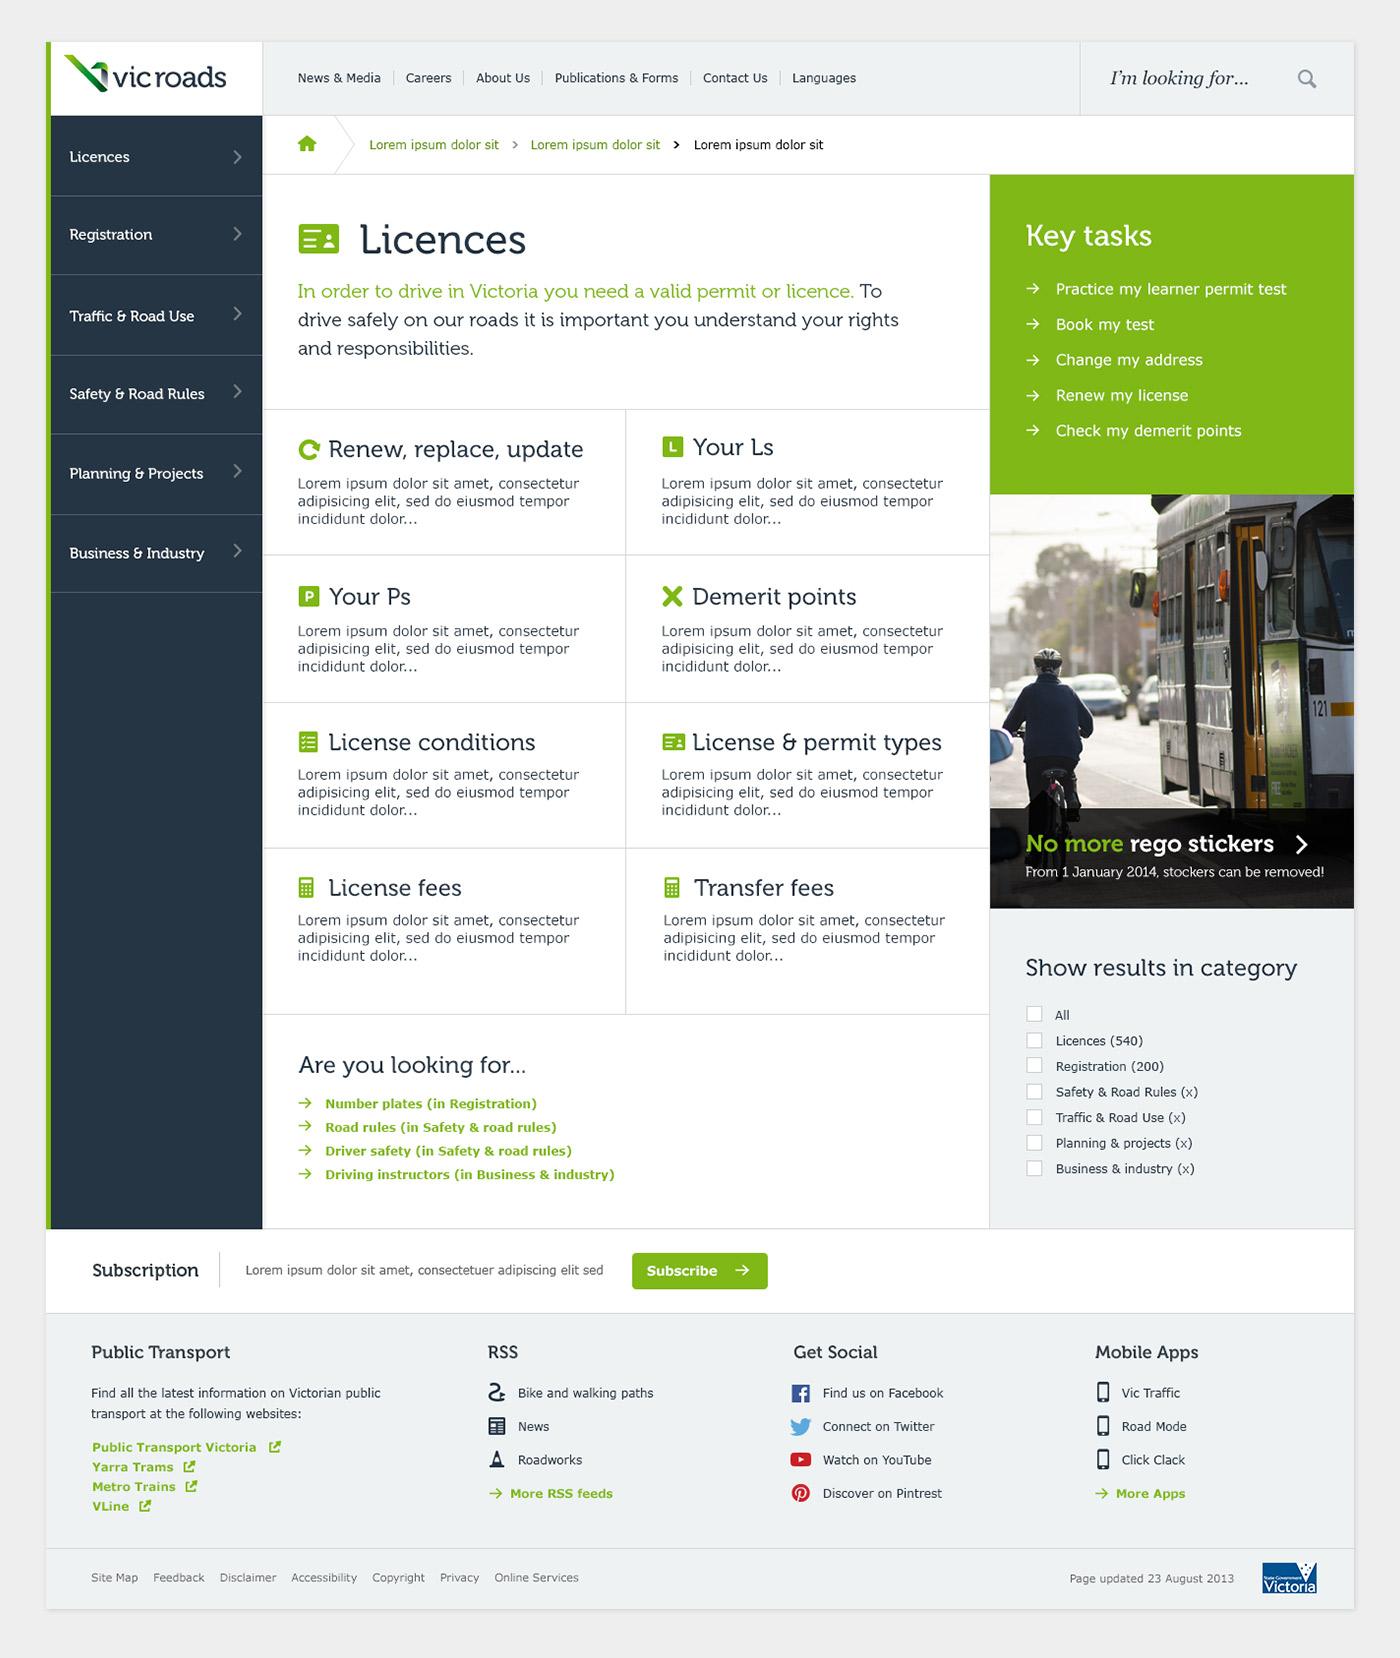 vicroads-website-2